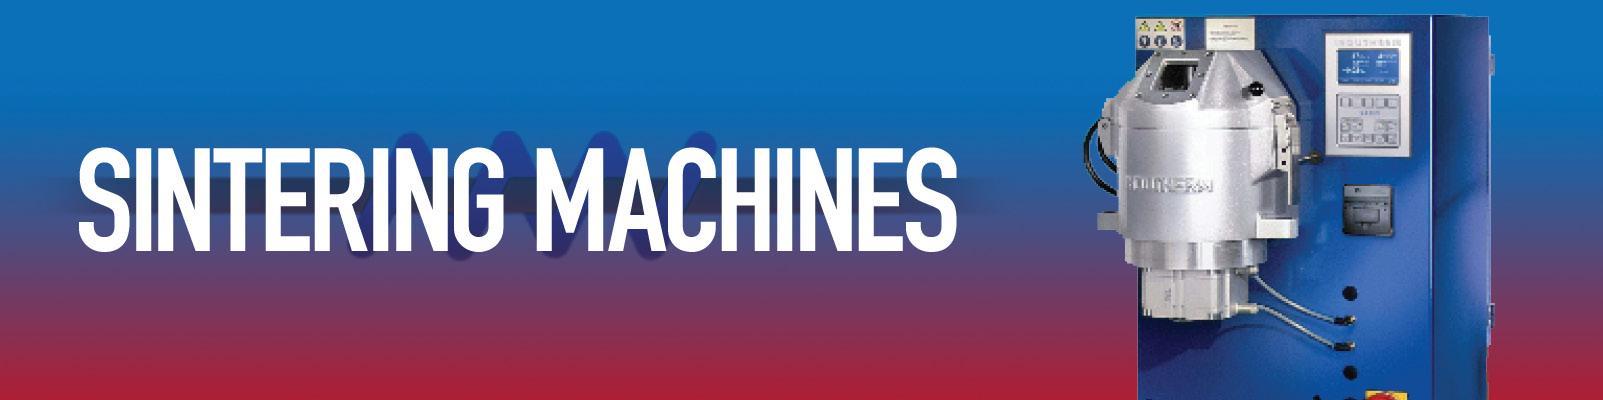 Sintering Machines